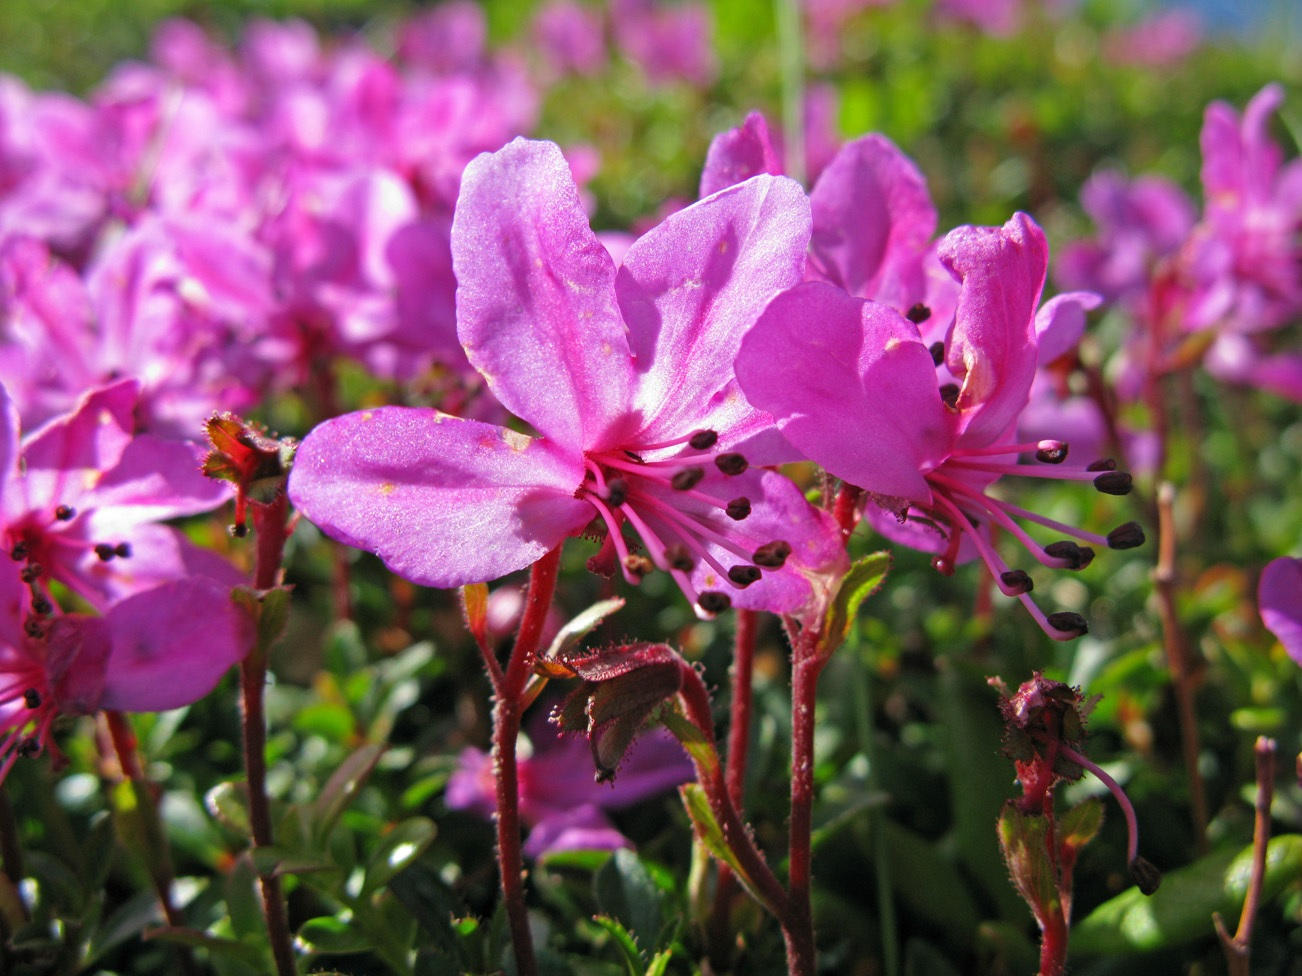 Цветы рододендрона крупно